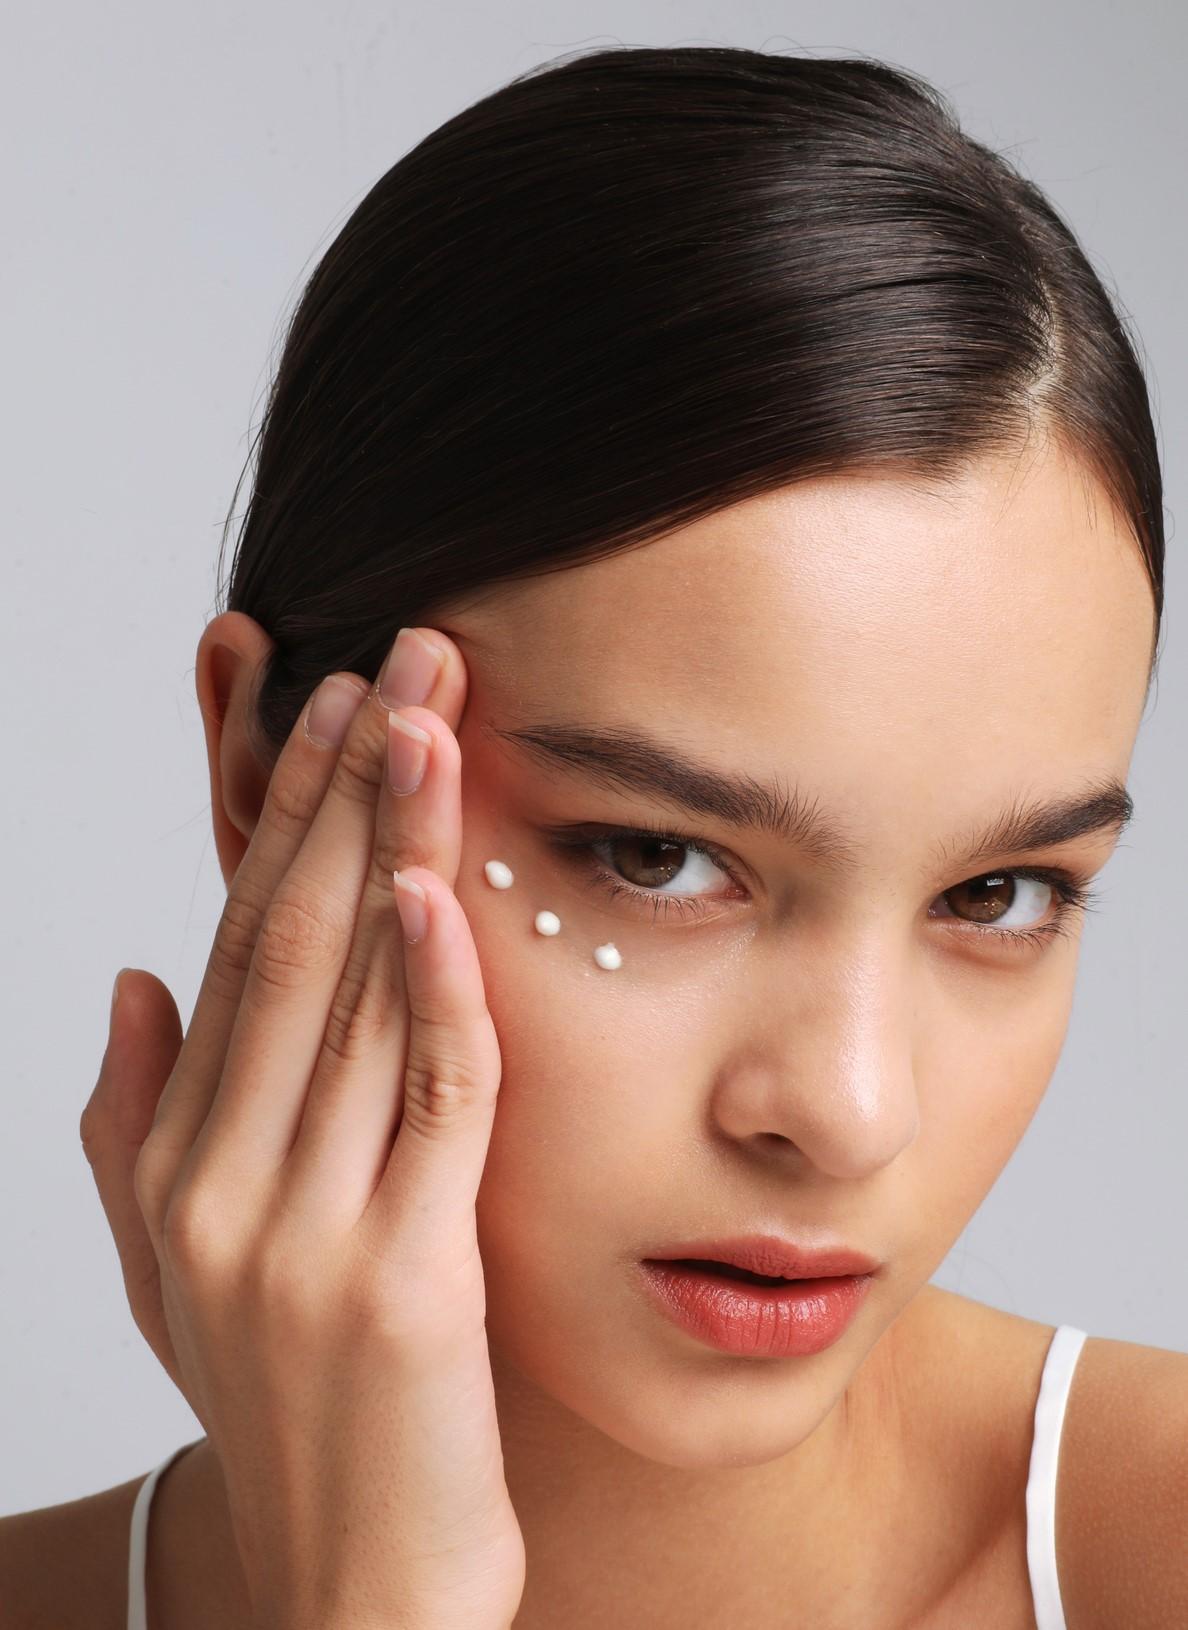 woman is applying an under-eye cream